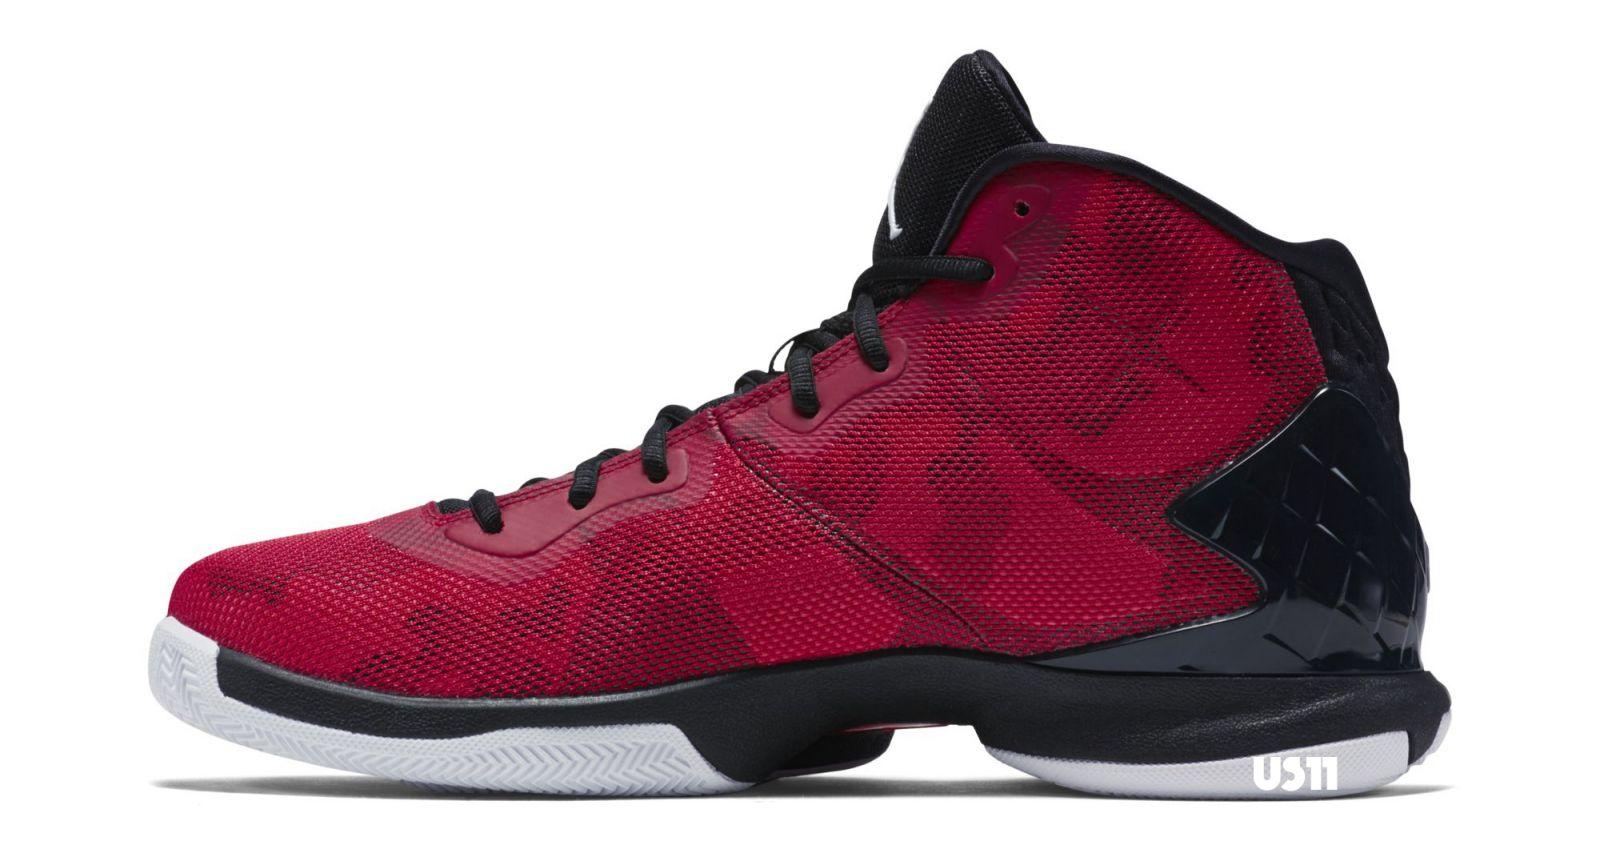 ebdfc819c303 Blake Griffin Will Wear These Jordans Next Season. The Jordan Super.Fly 4.